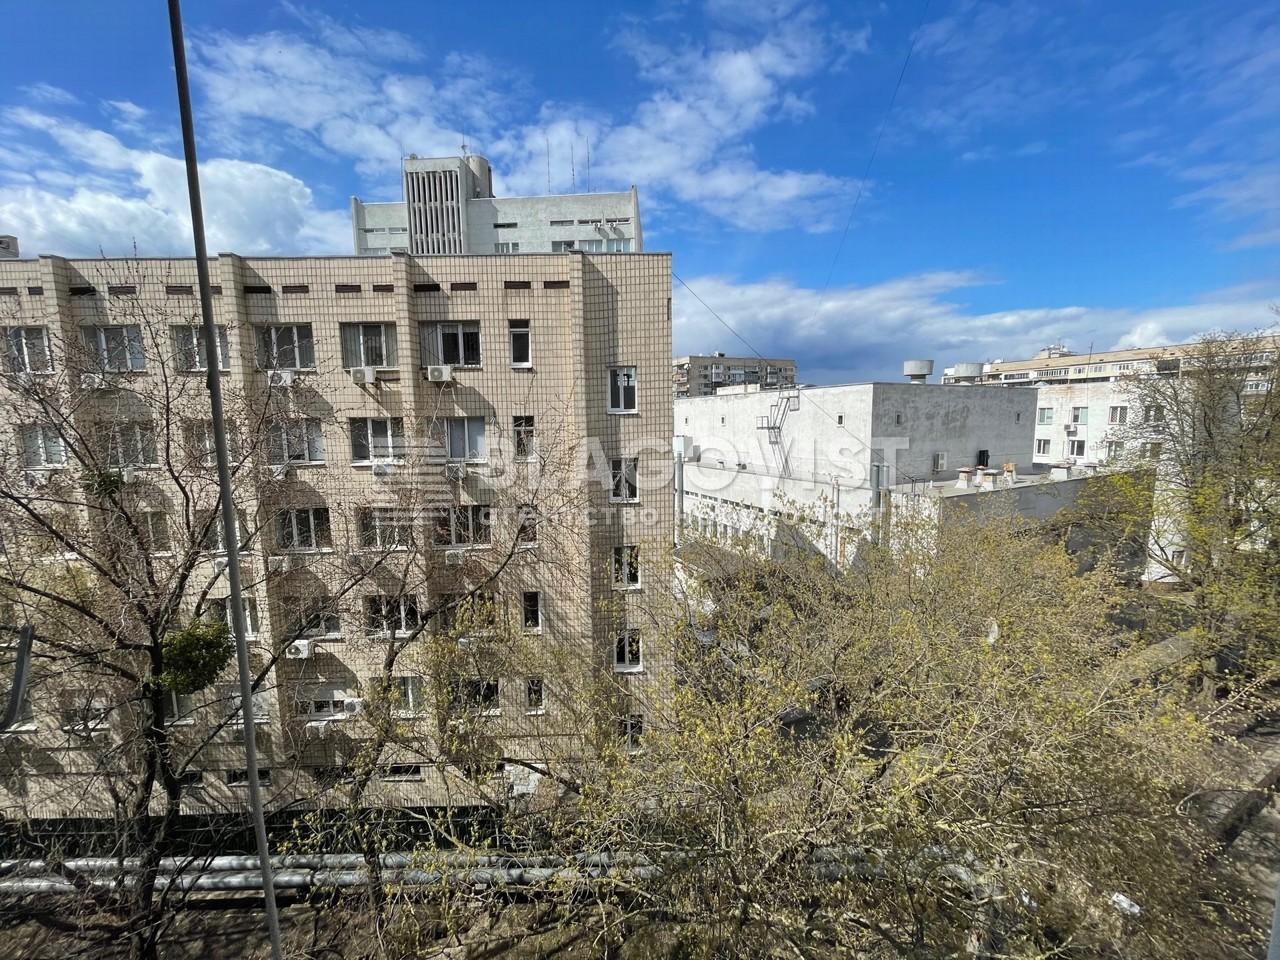 Квартира E-40979, Гордиенко Костя пер. (Чекистов пер.), 2а, Киев - Фото 20